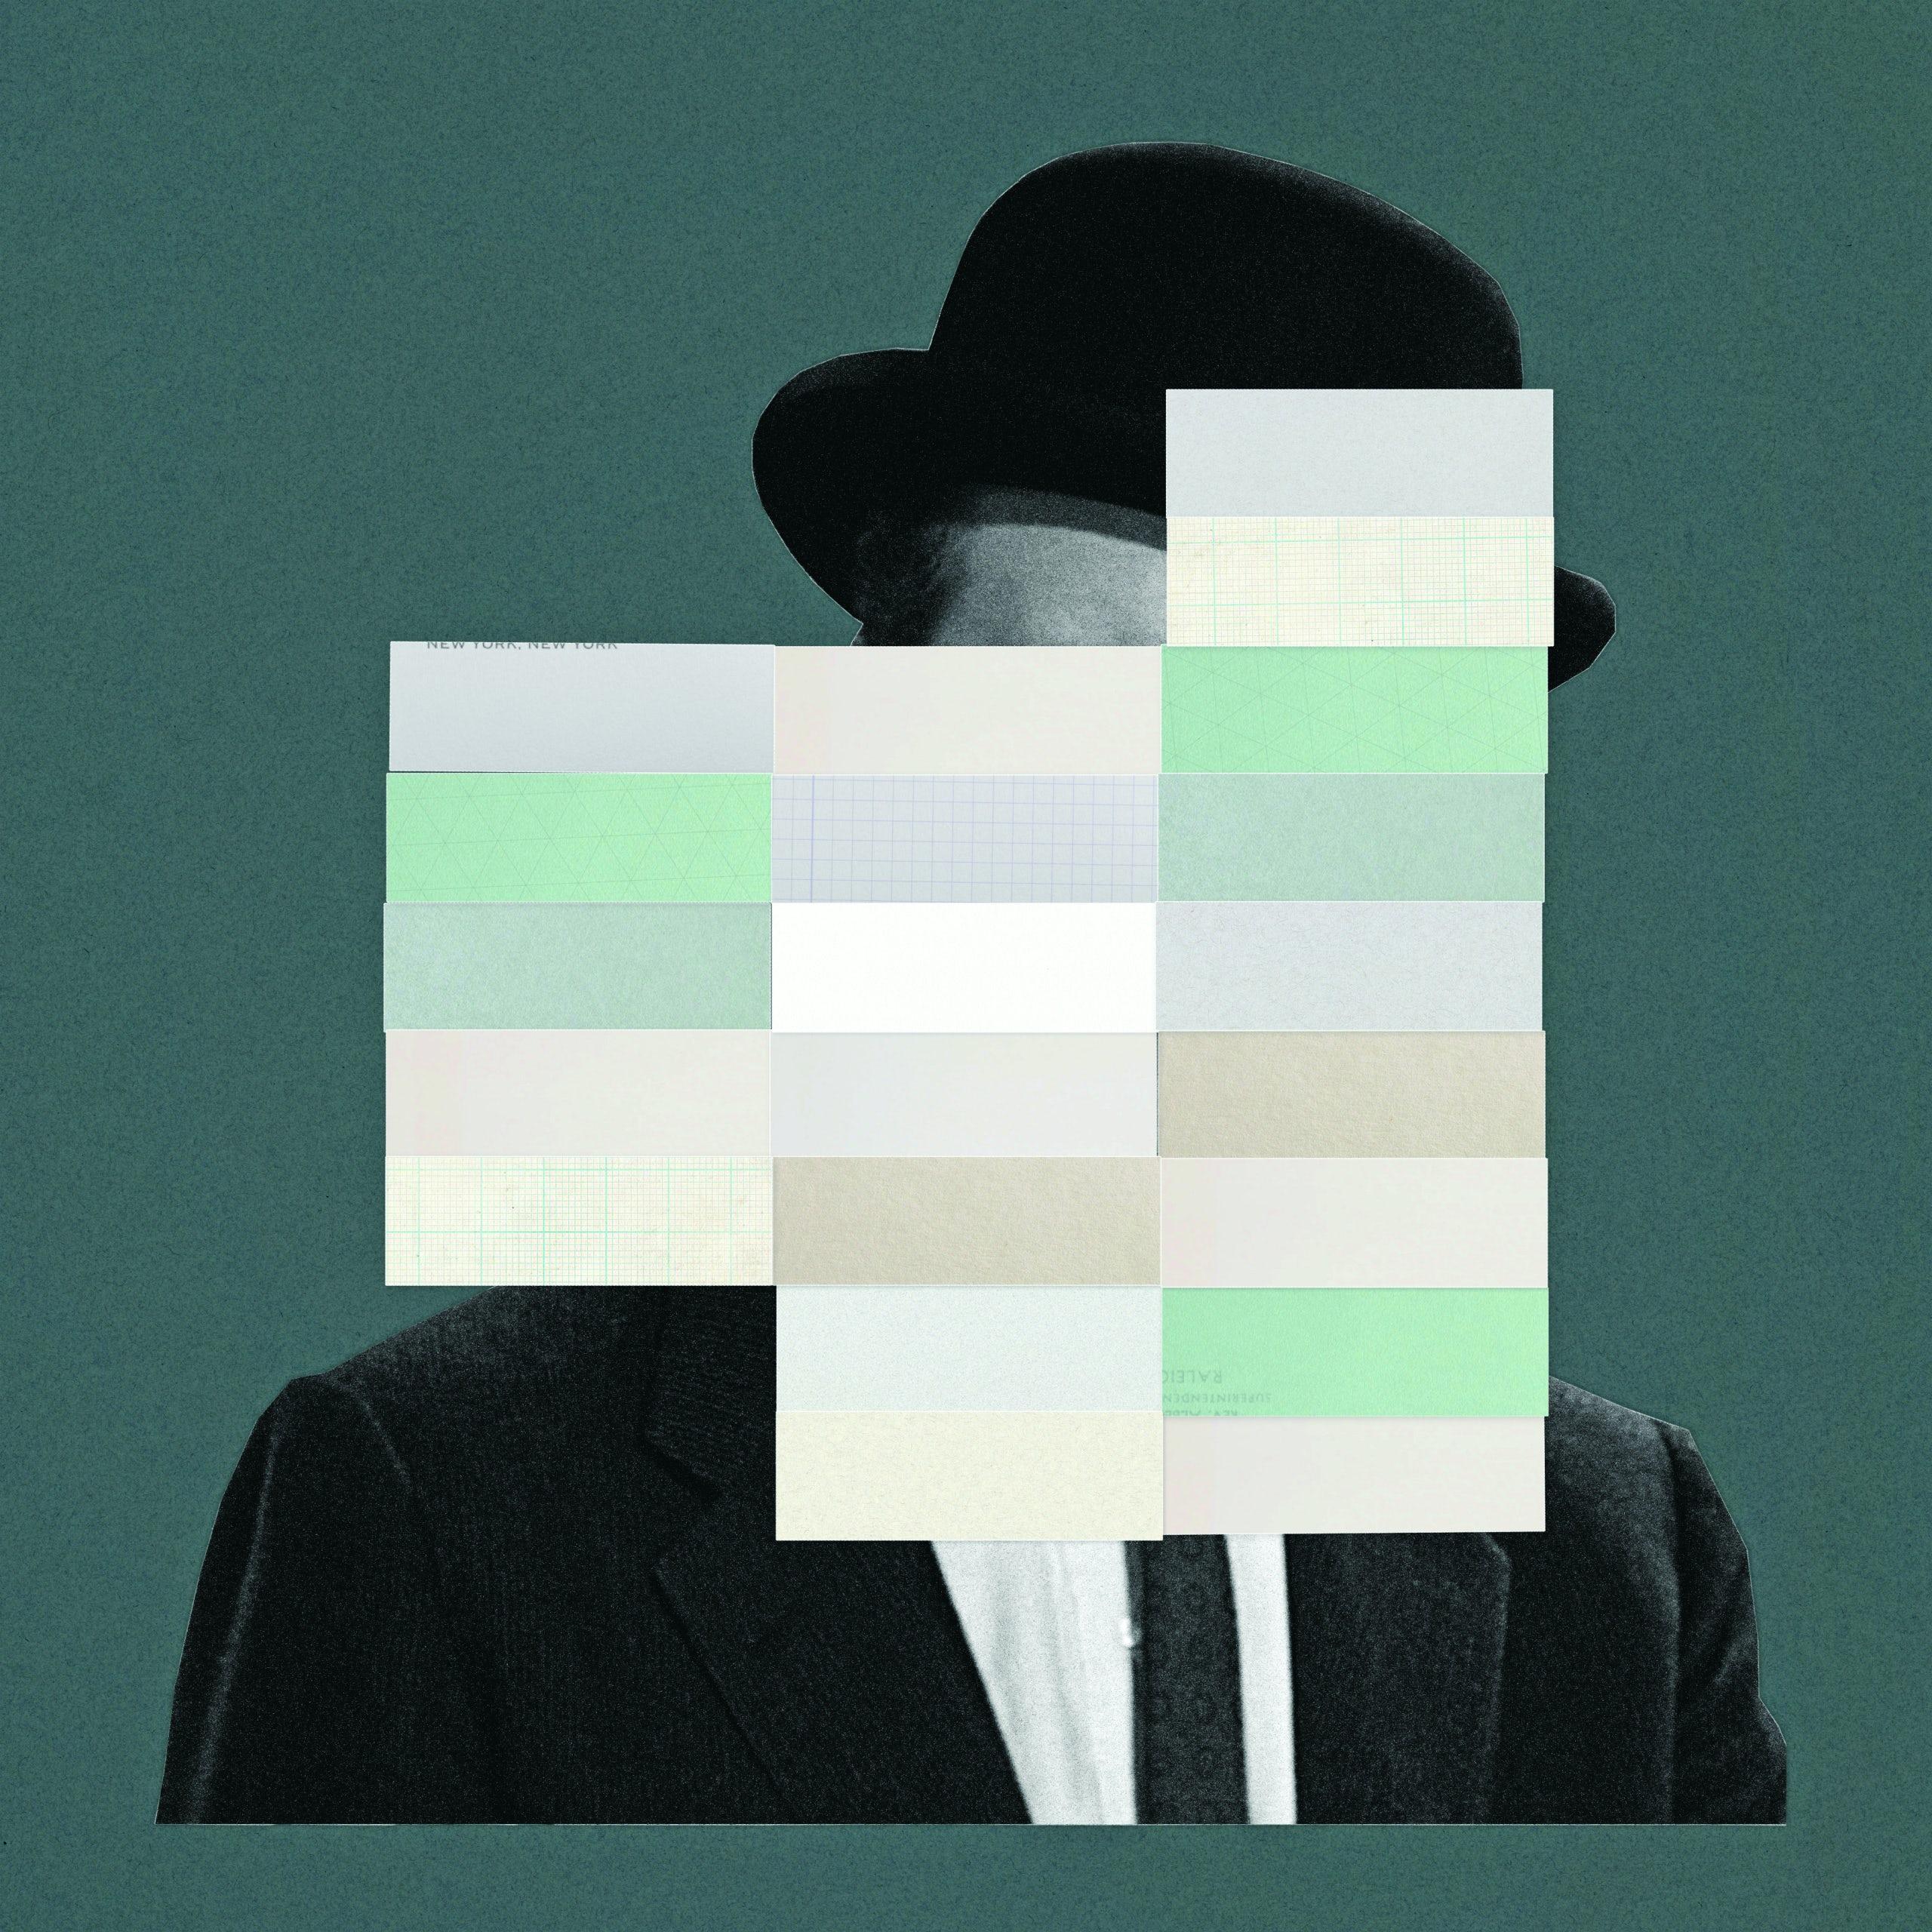 Daniel Benneworth-Gray